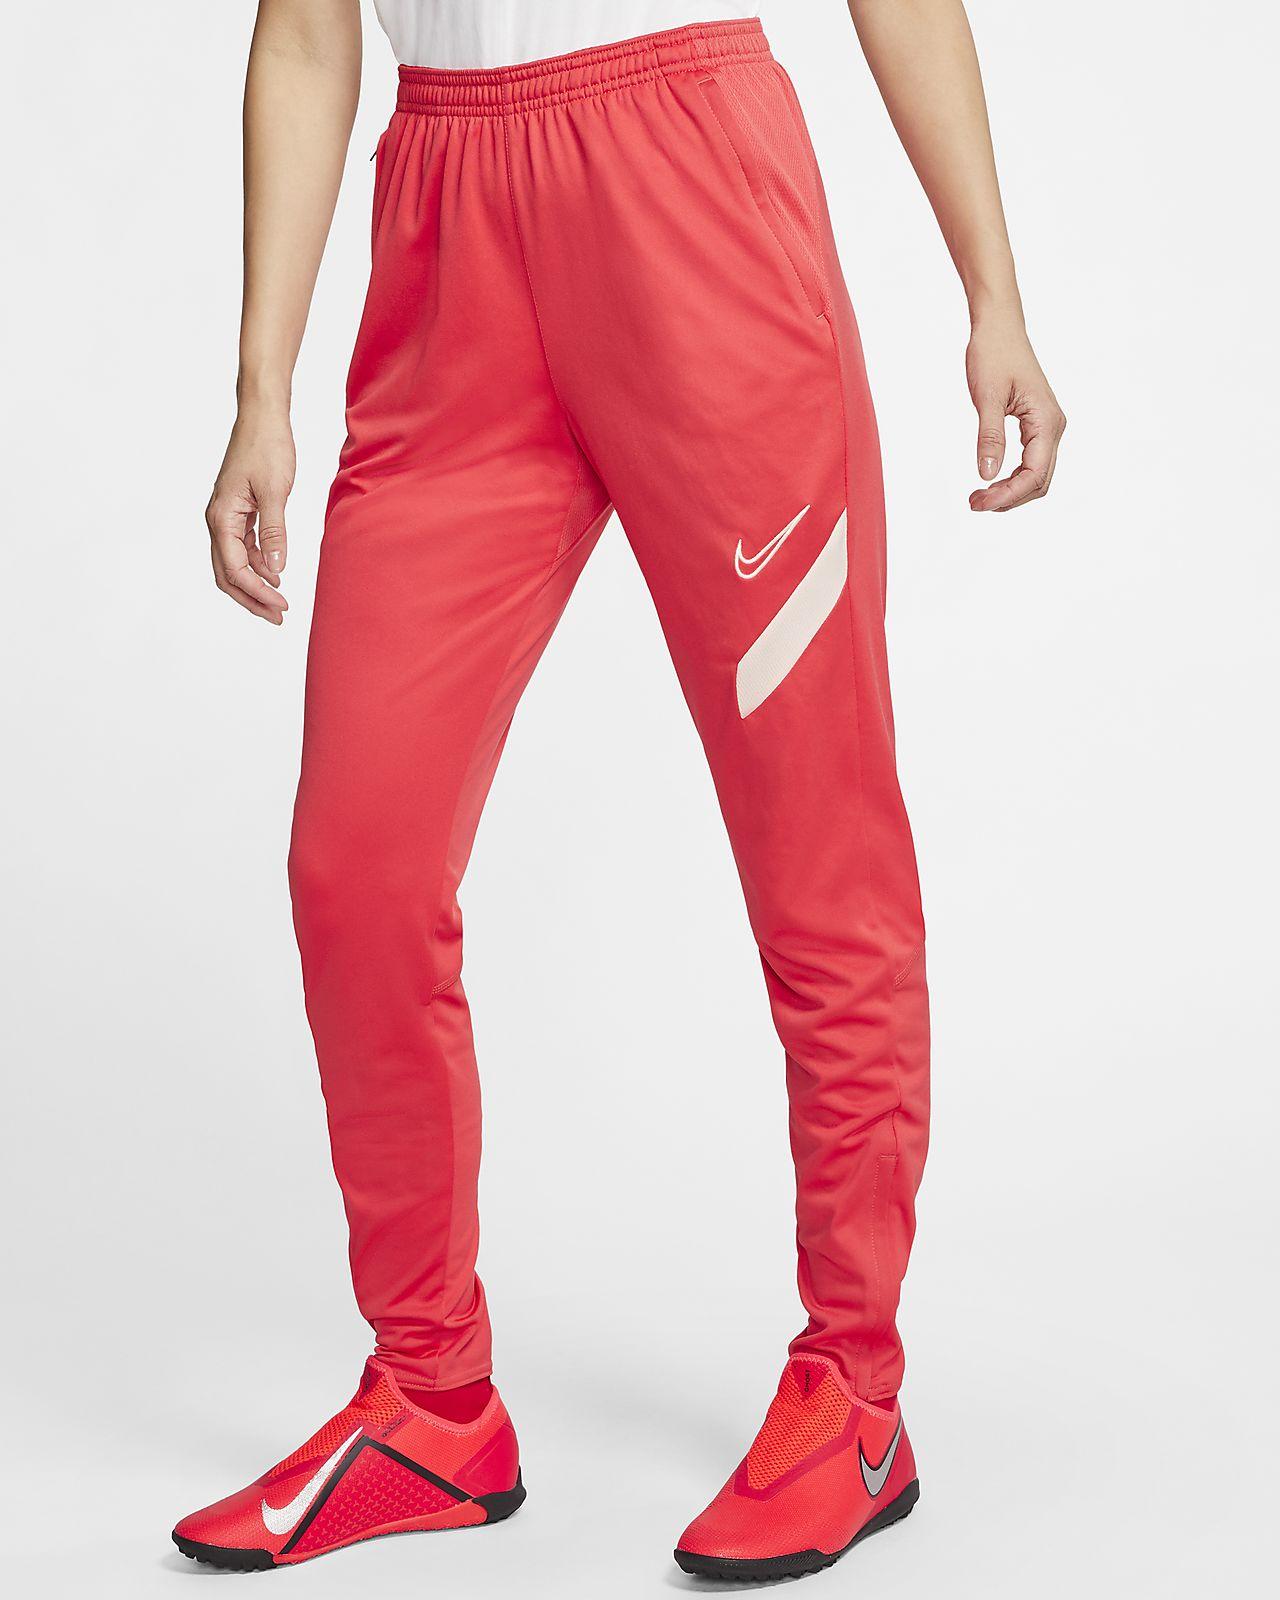 Nike Dri FIT Academy Pro Women's Football Pants